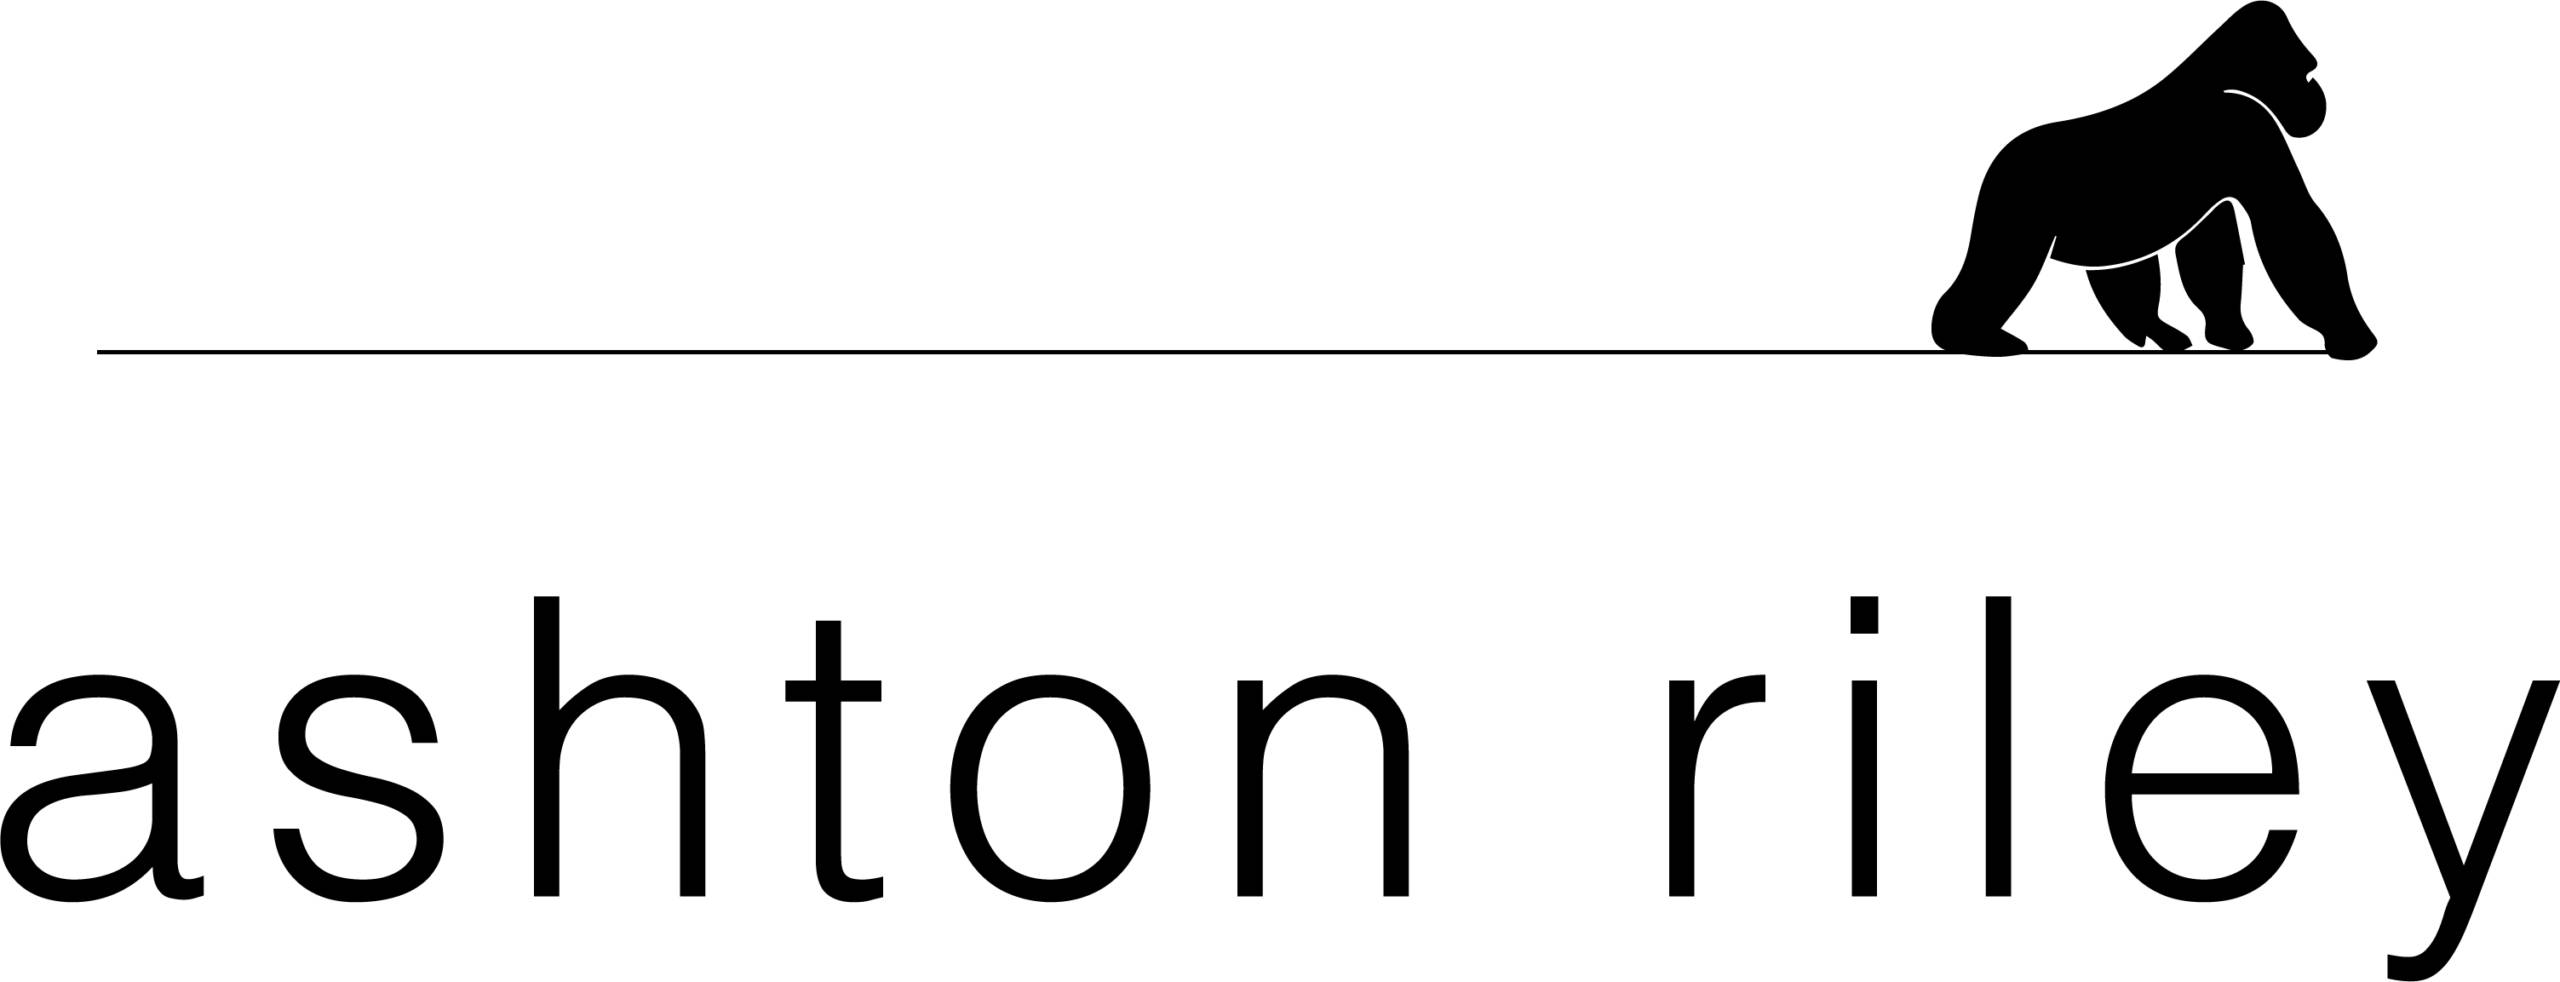 ashton-riley-hi-res-scaled